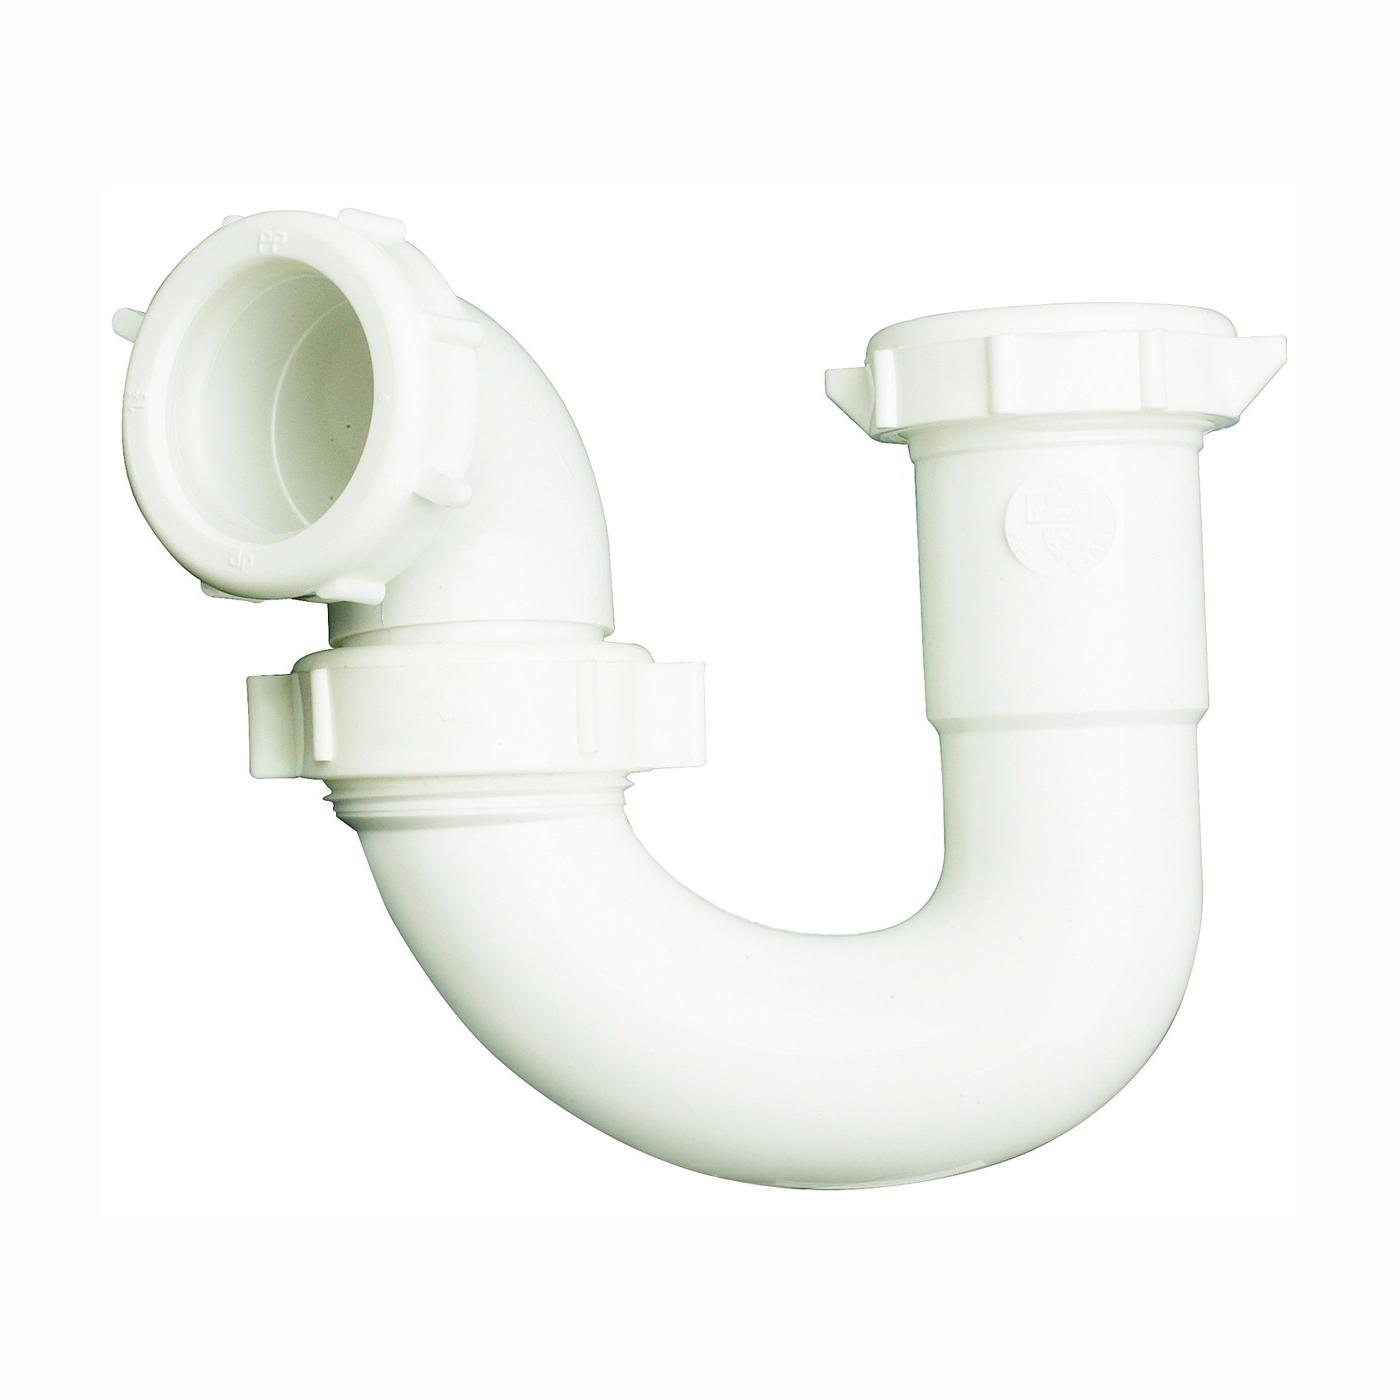 Picture of Plumb Pak PP20960 Repair Trap, 1-1/2 in, Plastic, White